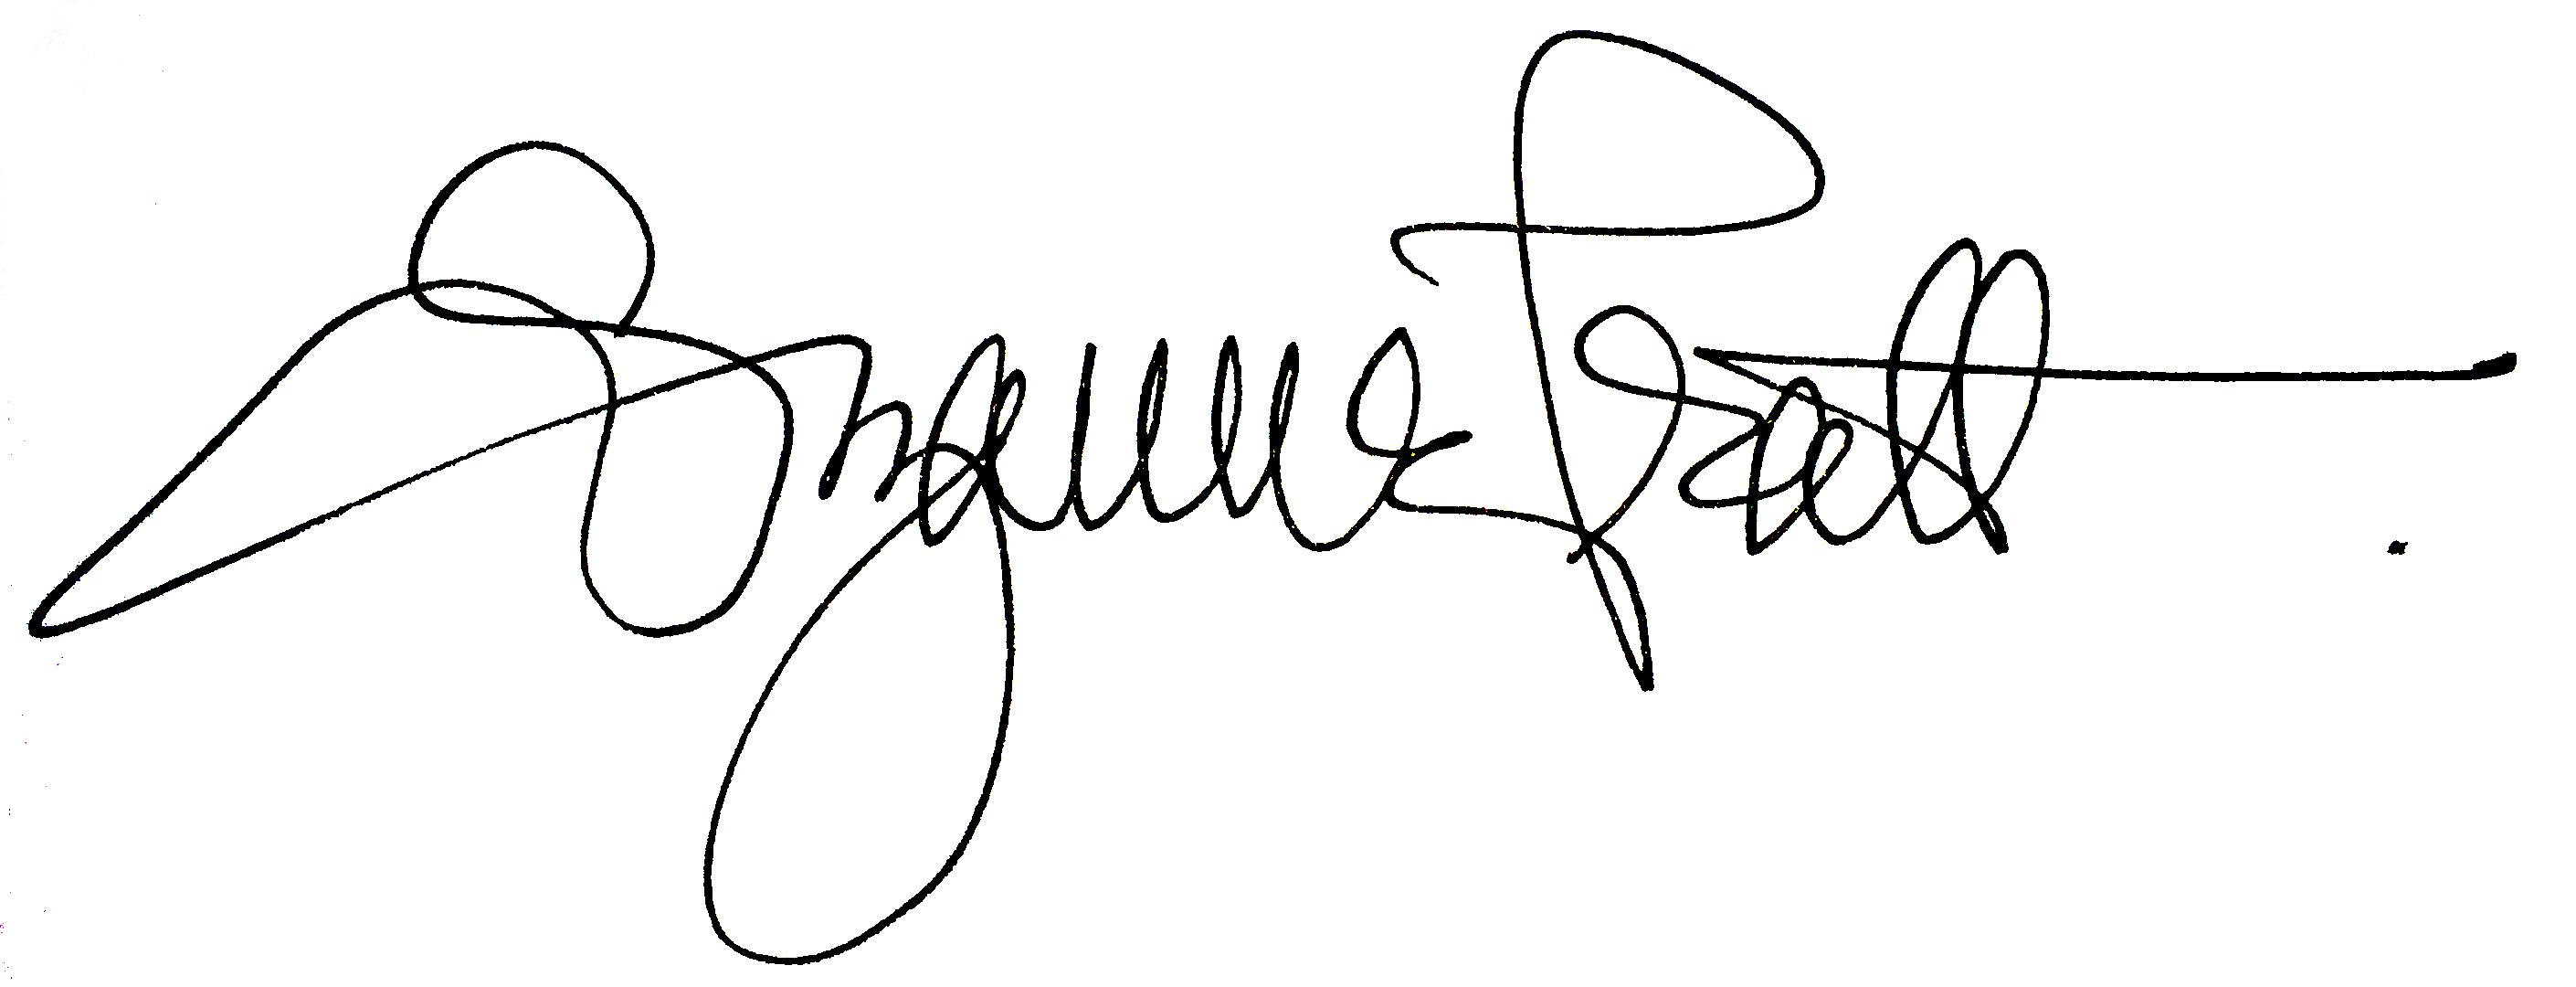 Suzanne Pratt's Signature